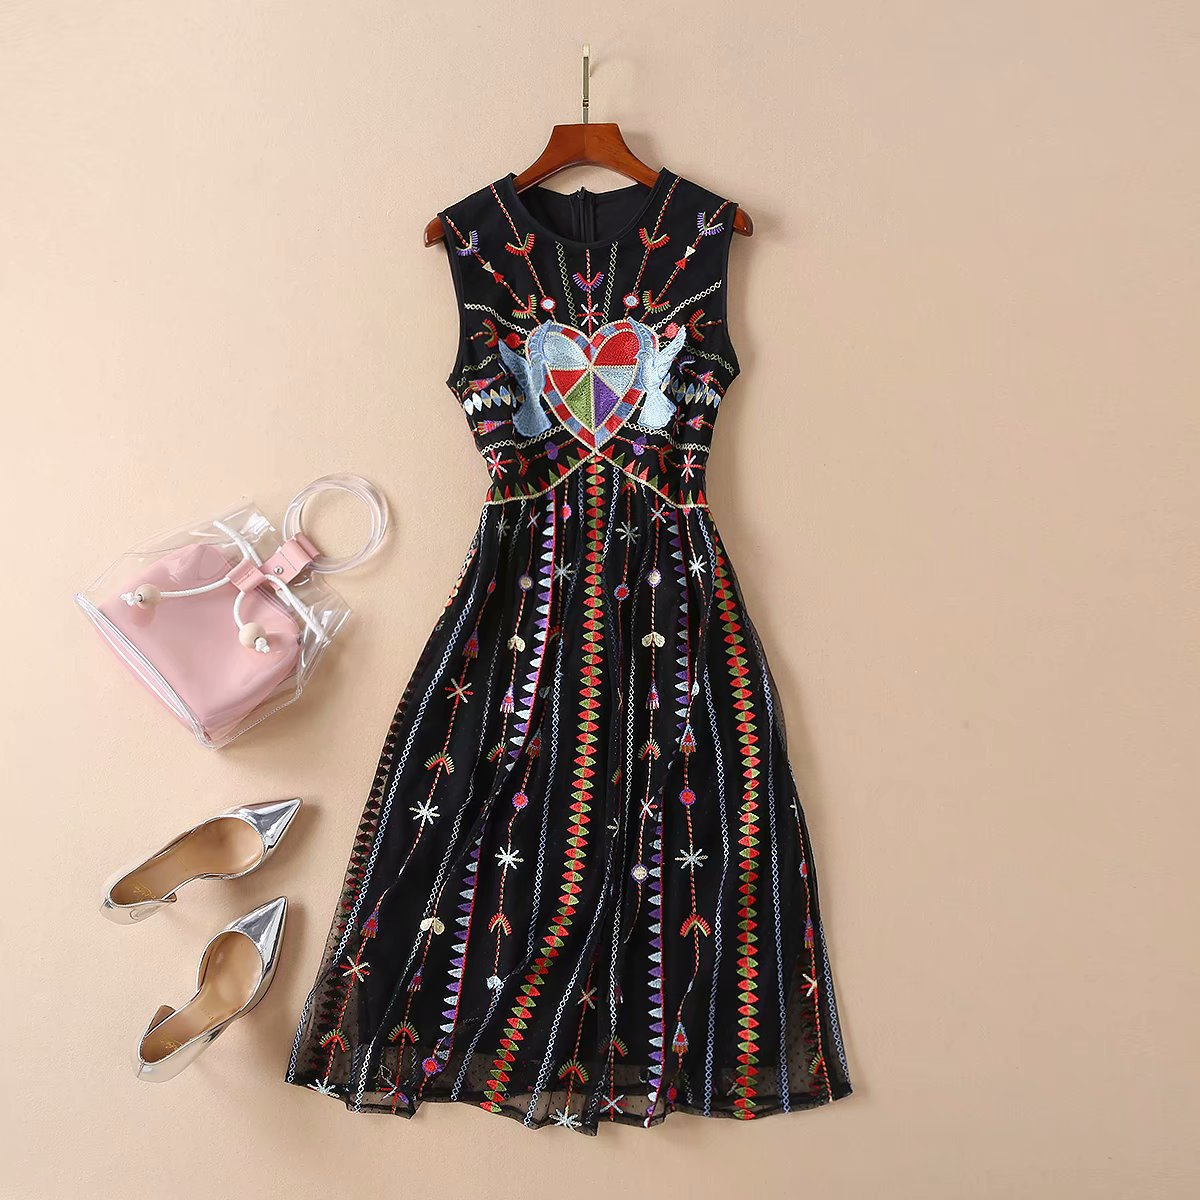 Women girls colorful heart embroidery black mesh dress sleeveless cute a-line heavy designer dresses new 2019 summer a-line